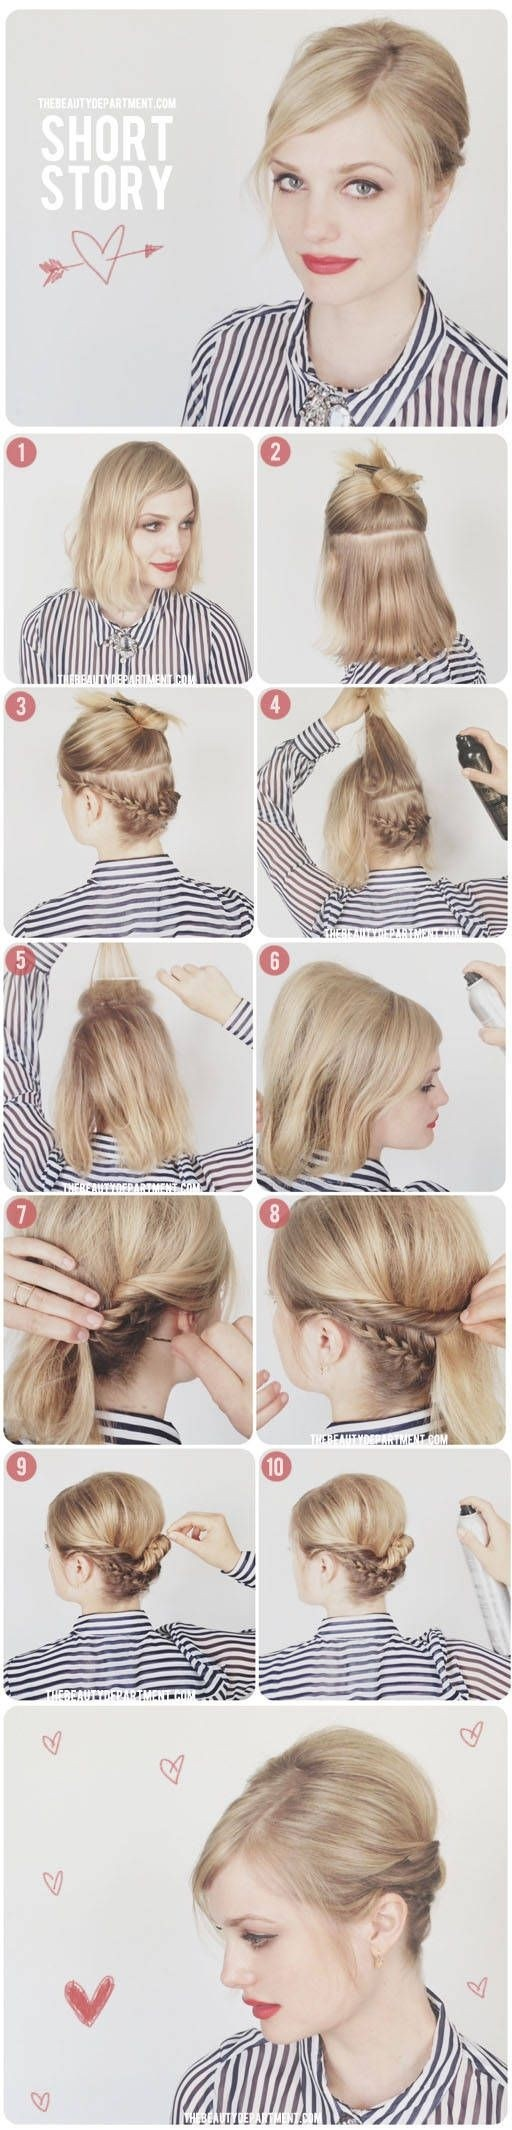 8 Cute Updo Hairstyles for Short Hair - PoPular Haircuts